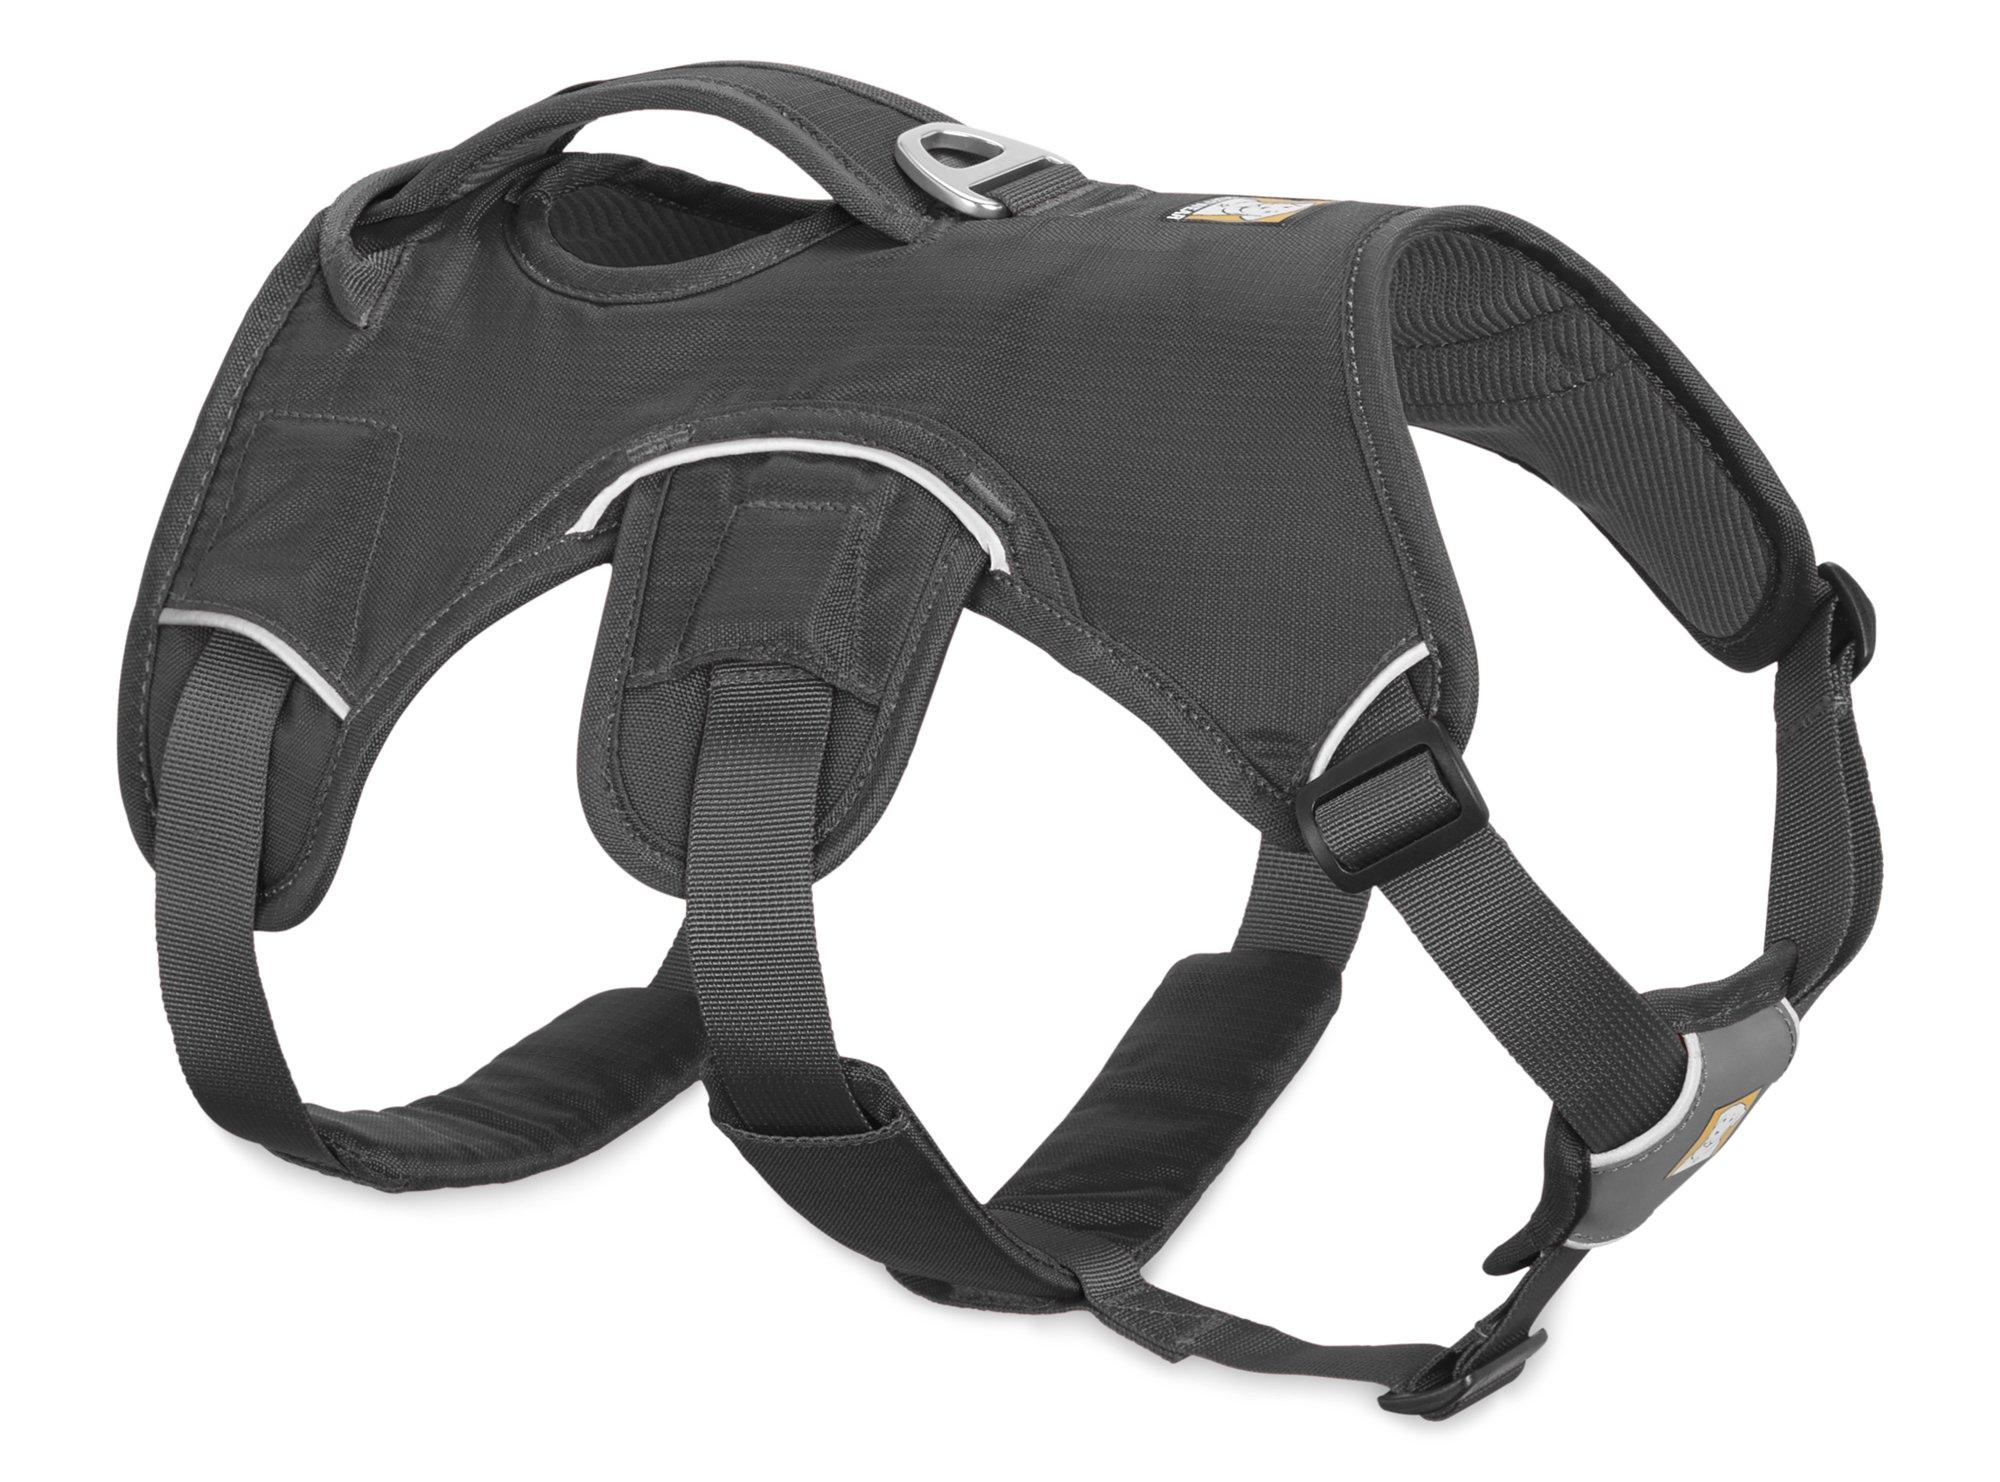 RUFFWEAR - Web Master Dog Harness with Lift Handle, Twilight Gray, Medium